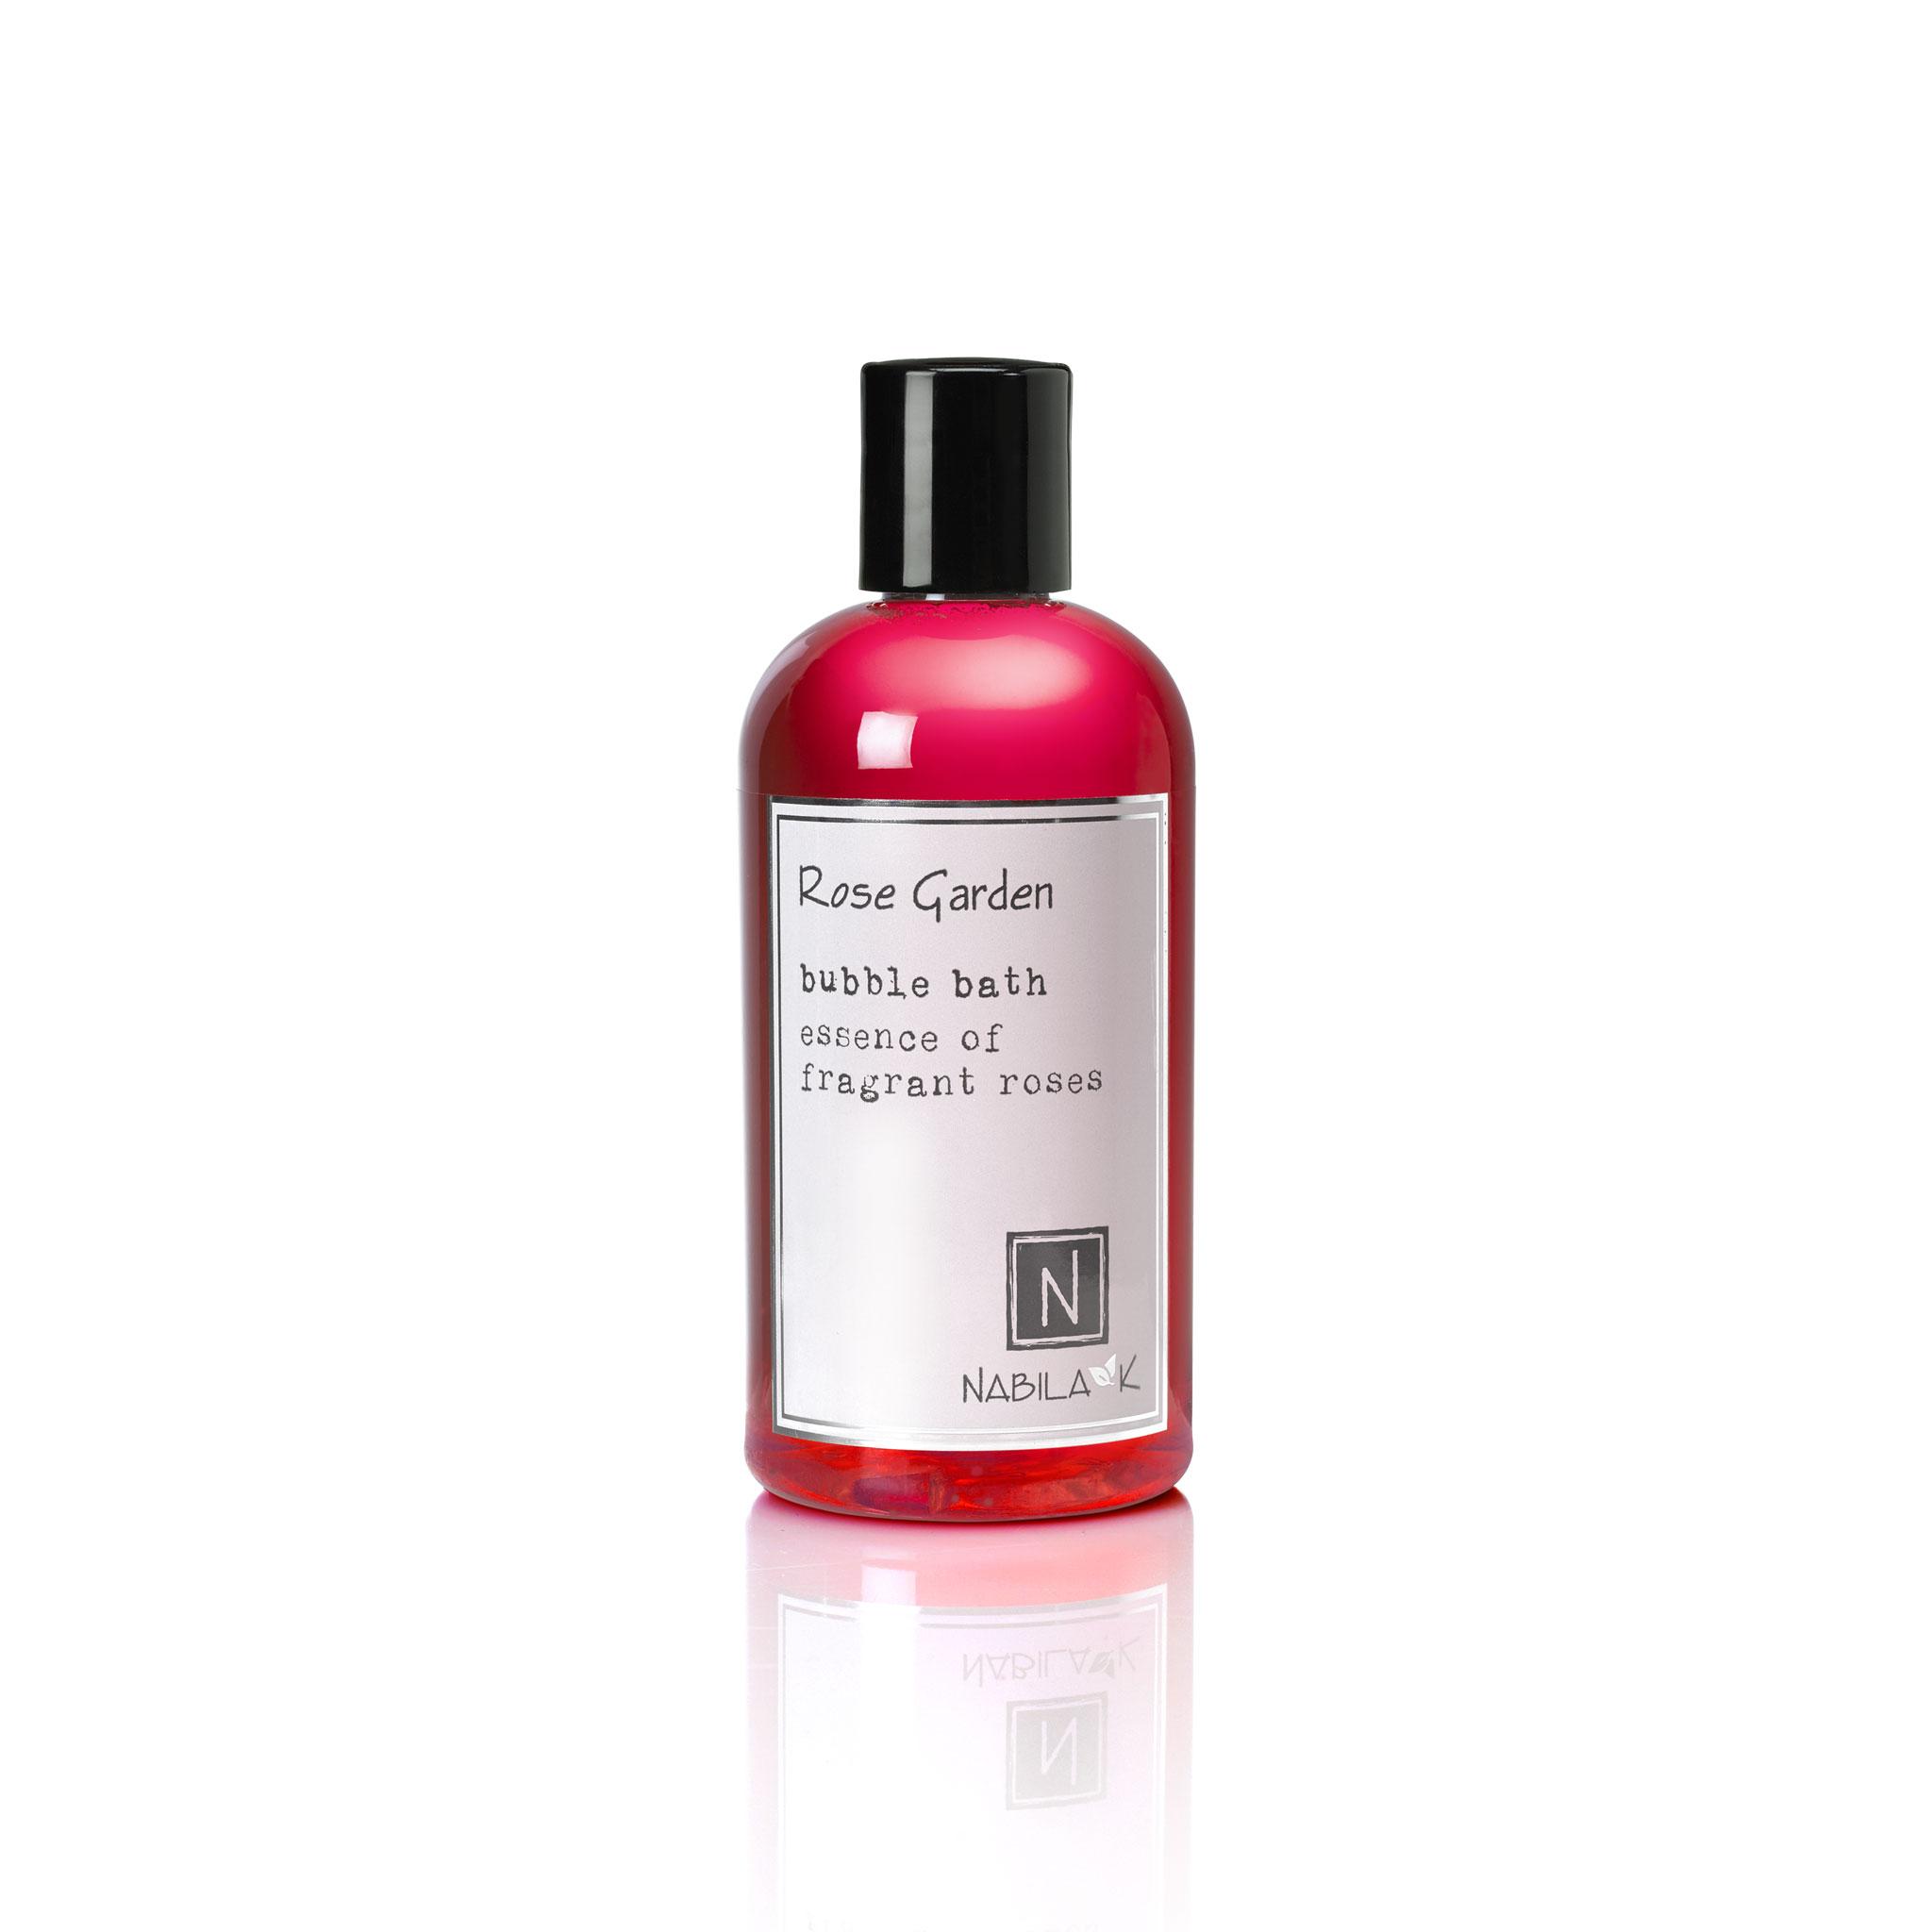 1 8oz bottle of rose garden bubble bath essence of fragrant roses